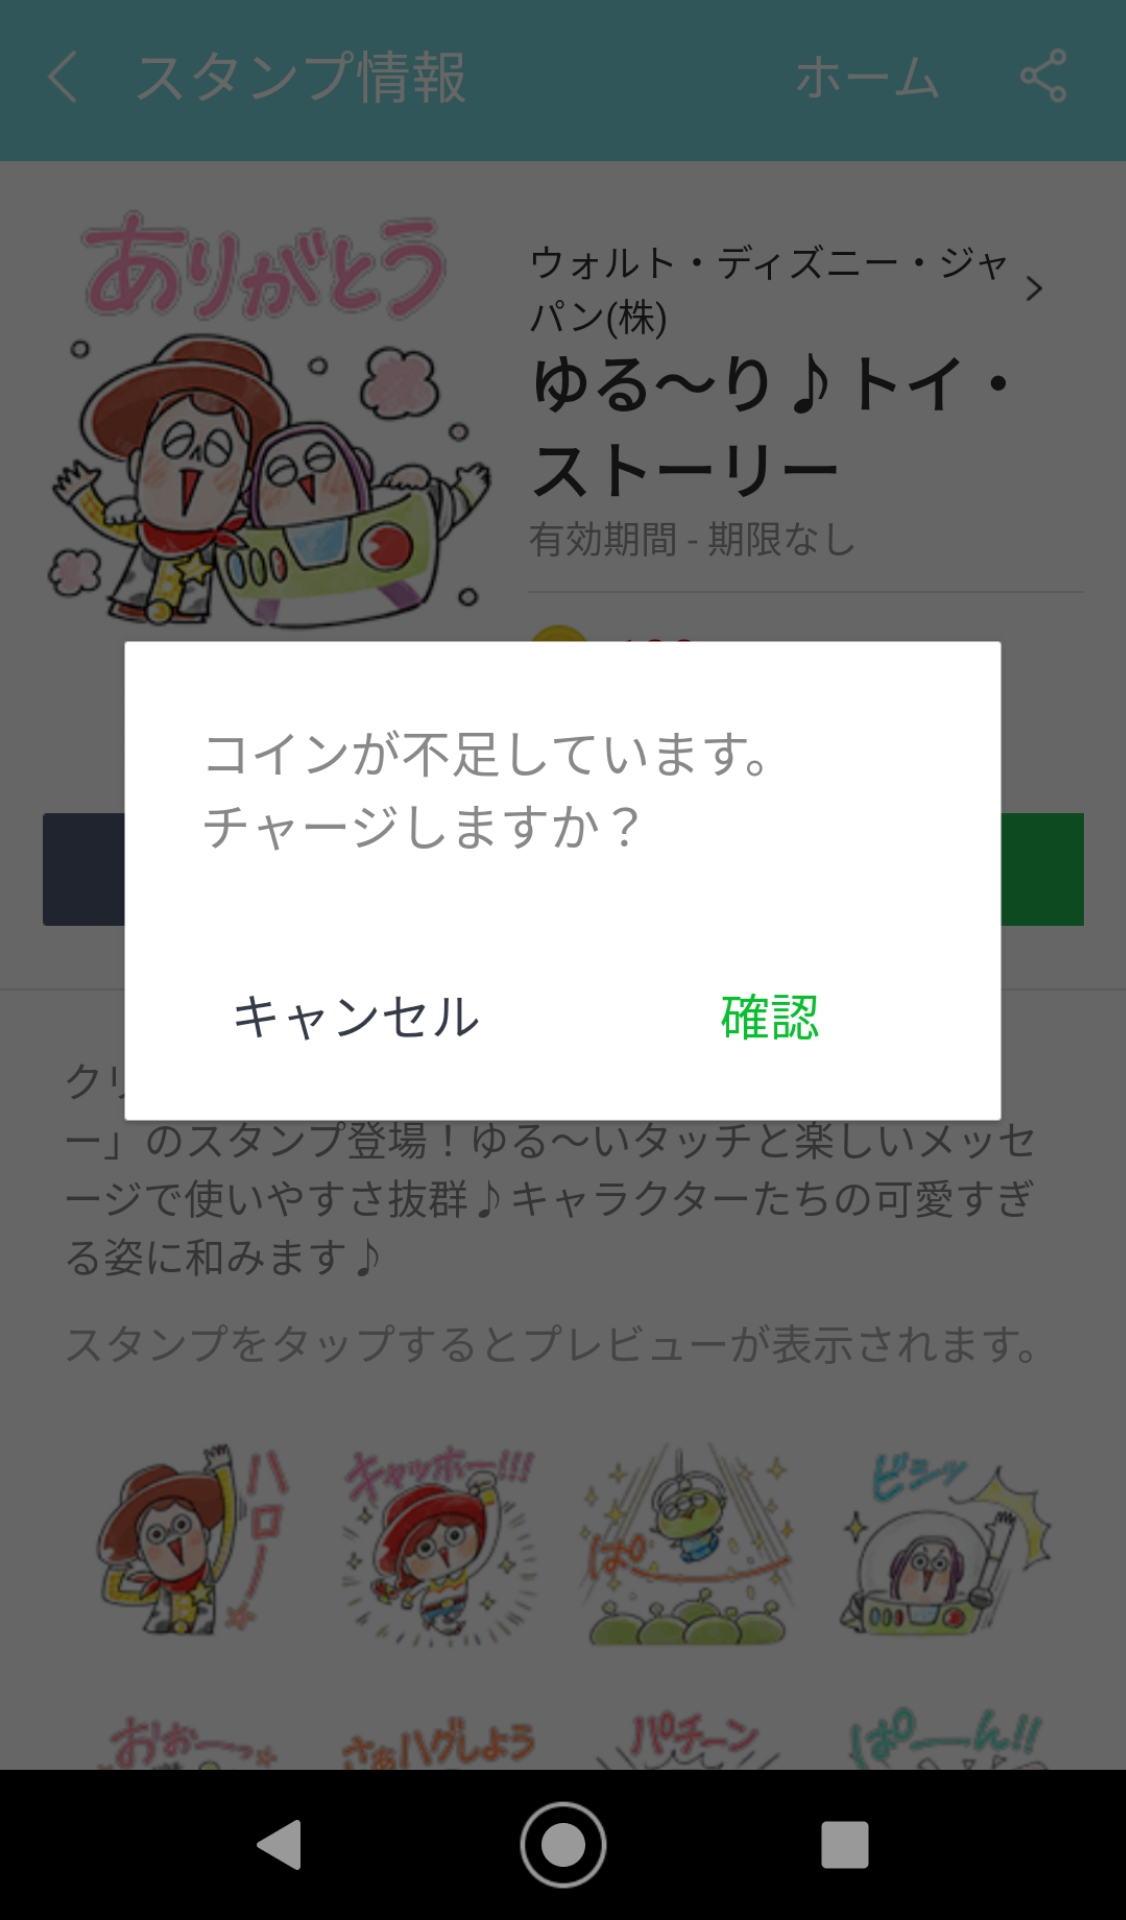 LINEスタンプ購入画面 コイン不足表示